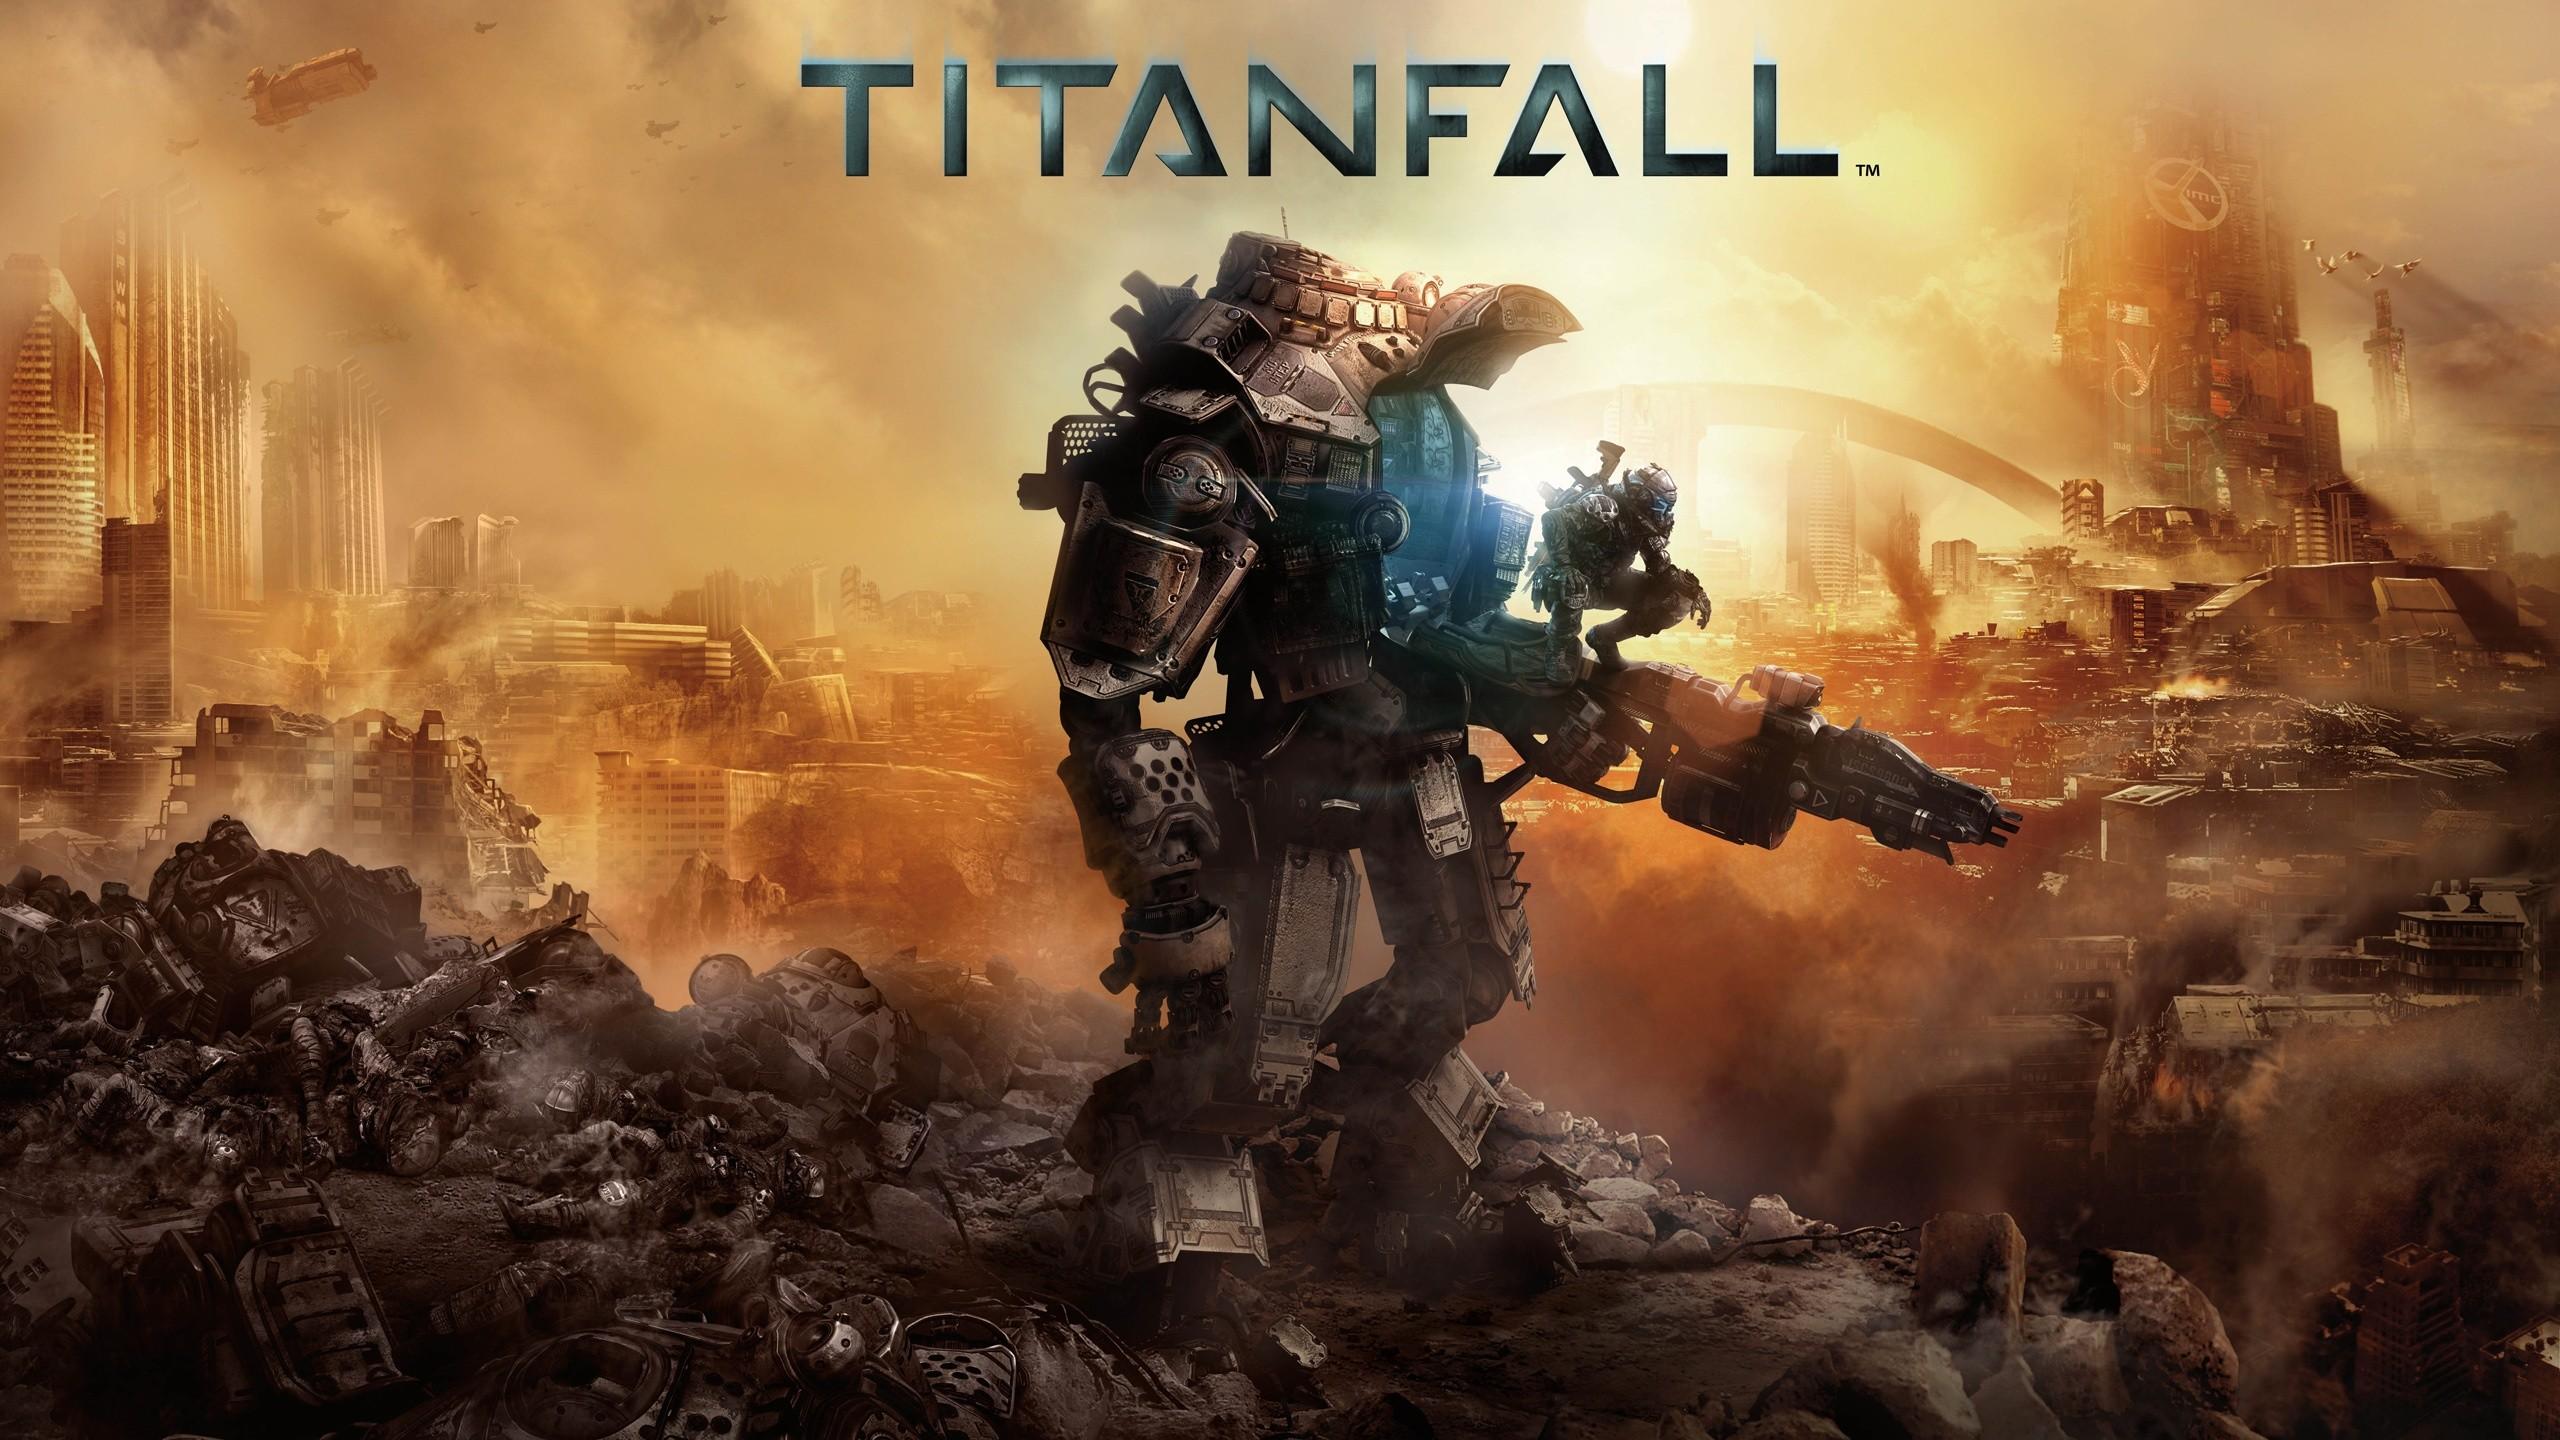 Description: Download Titanfall 2014 Game HD & Widescreen Games Wallpaper